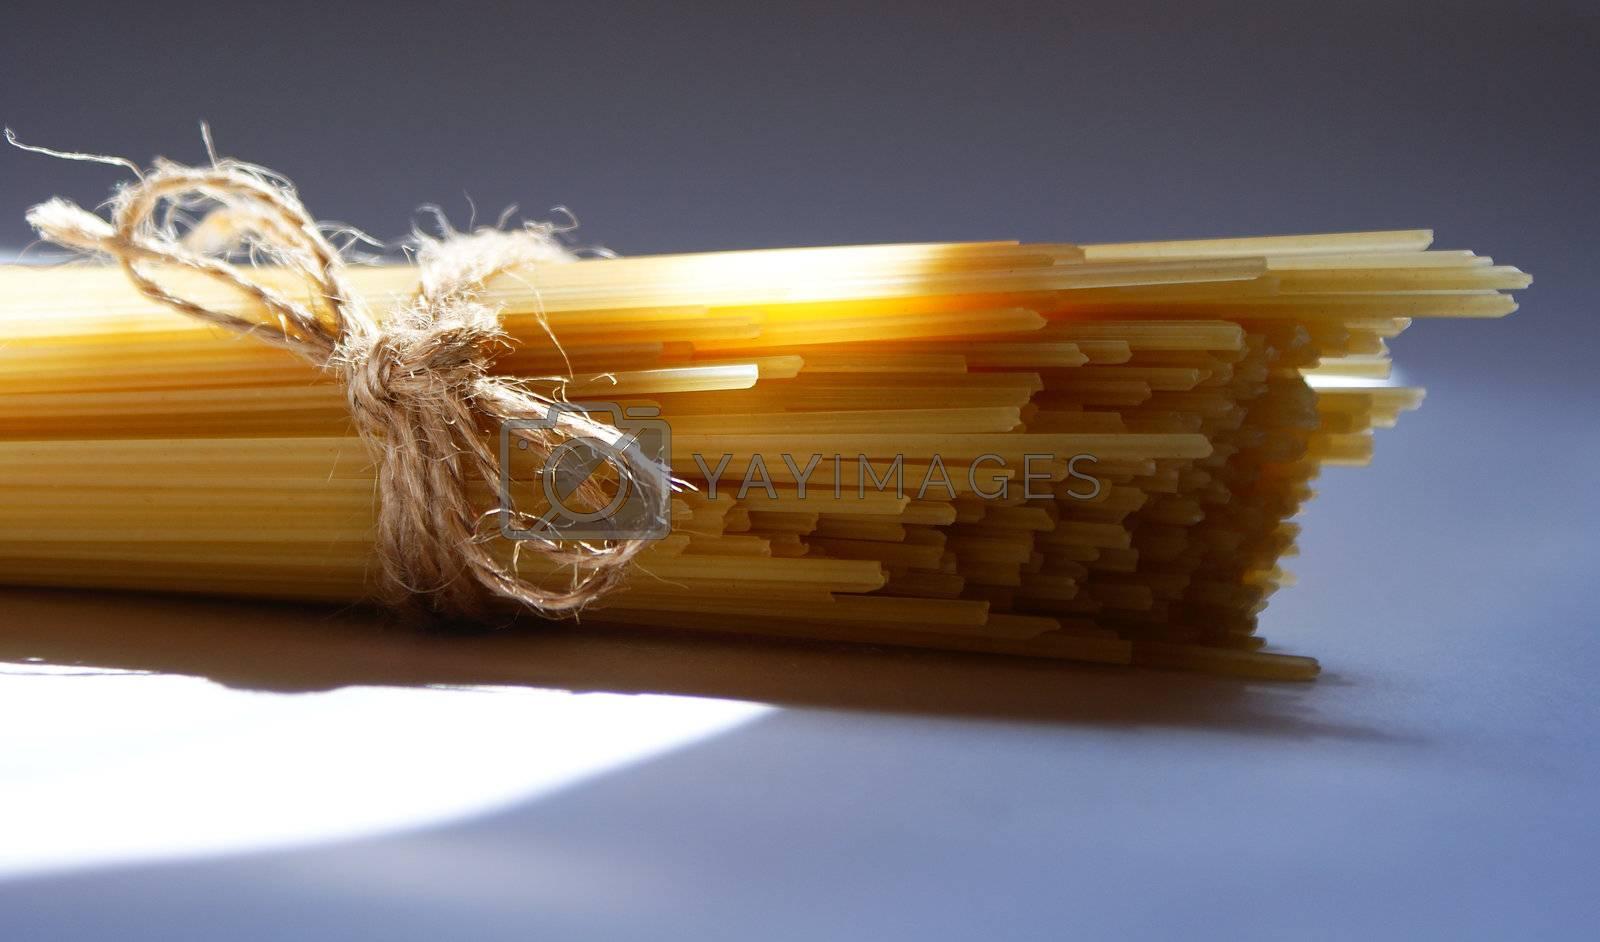 Royalty free image of spaghetti7 by Katchen